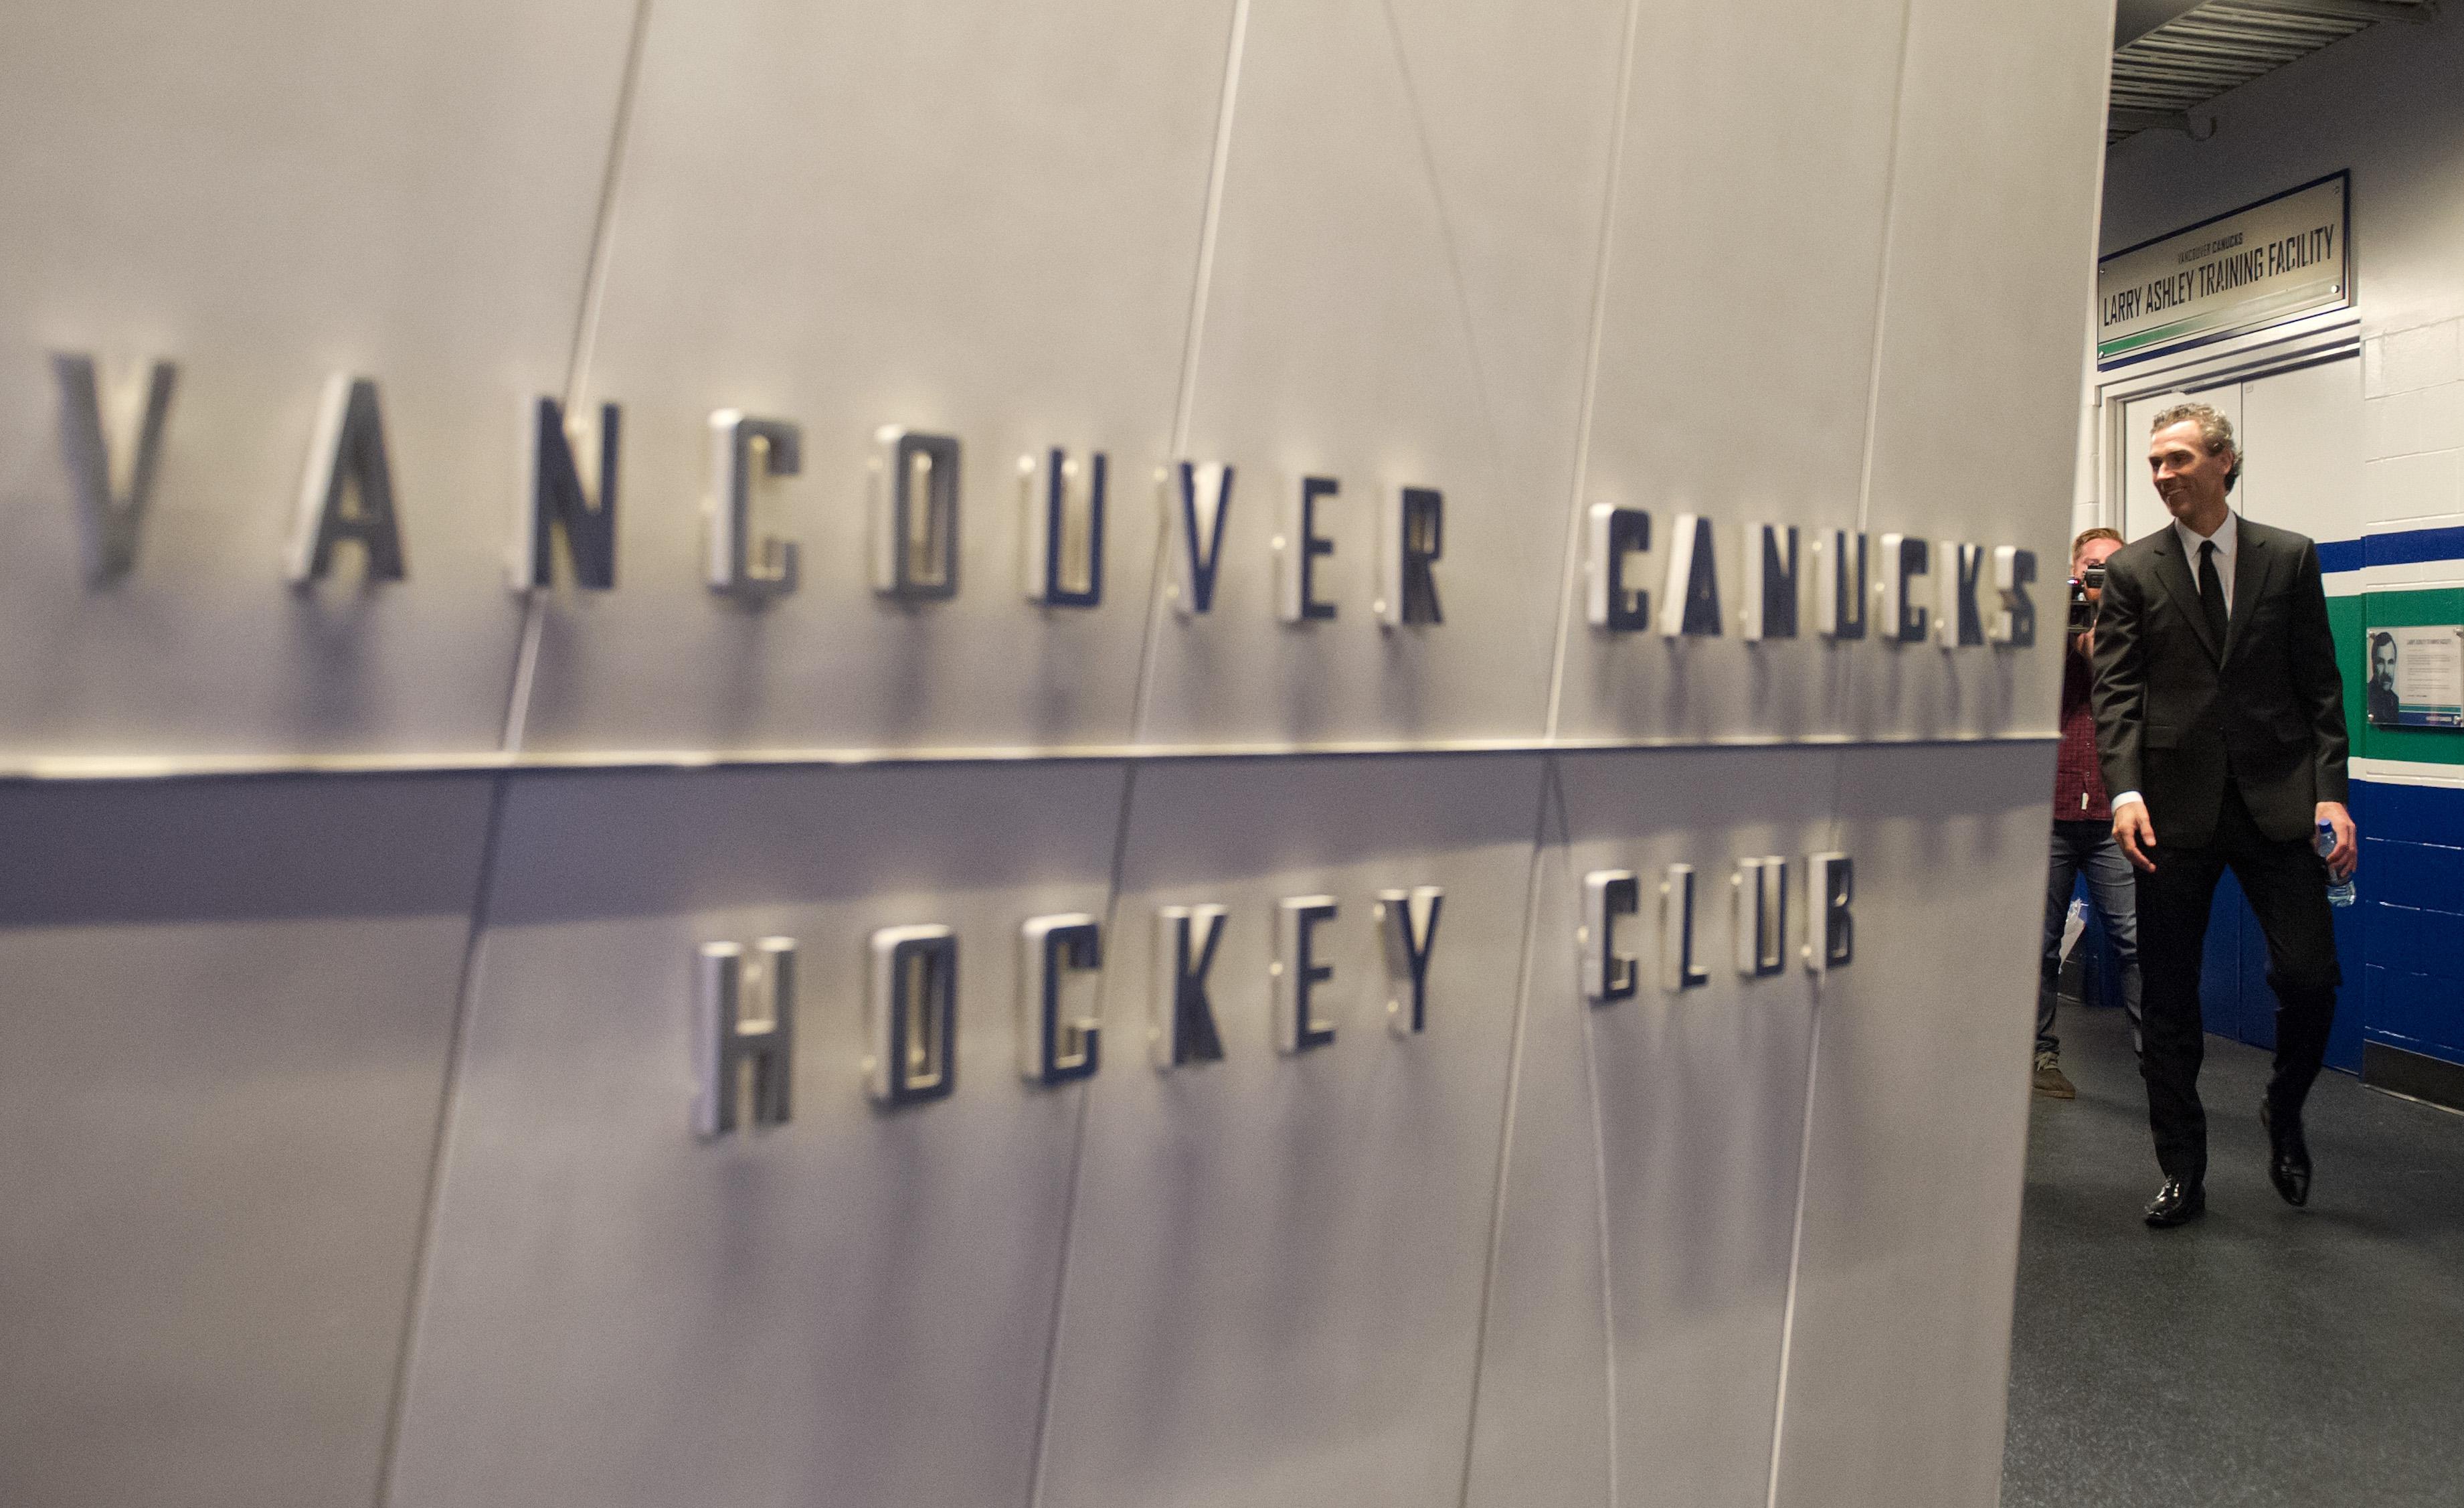 Vancouver Canucks Announce Trevor Linden As President Hockey Operations